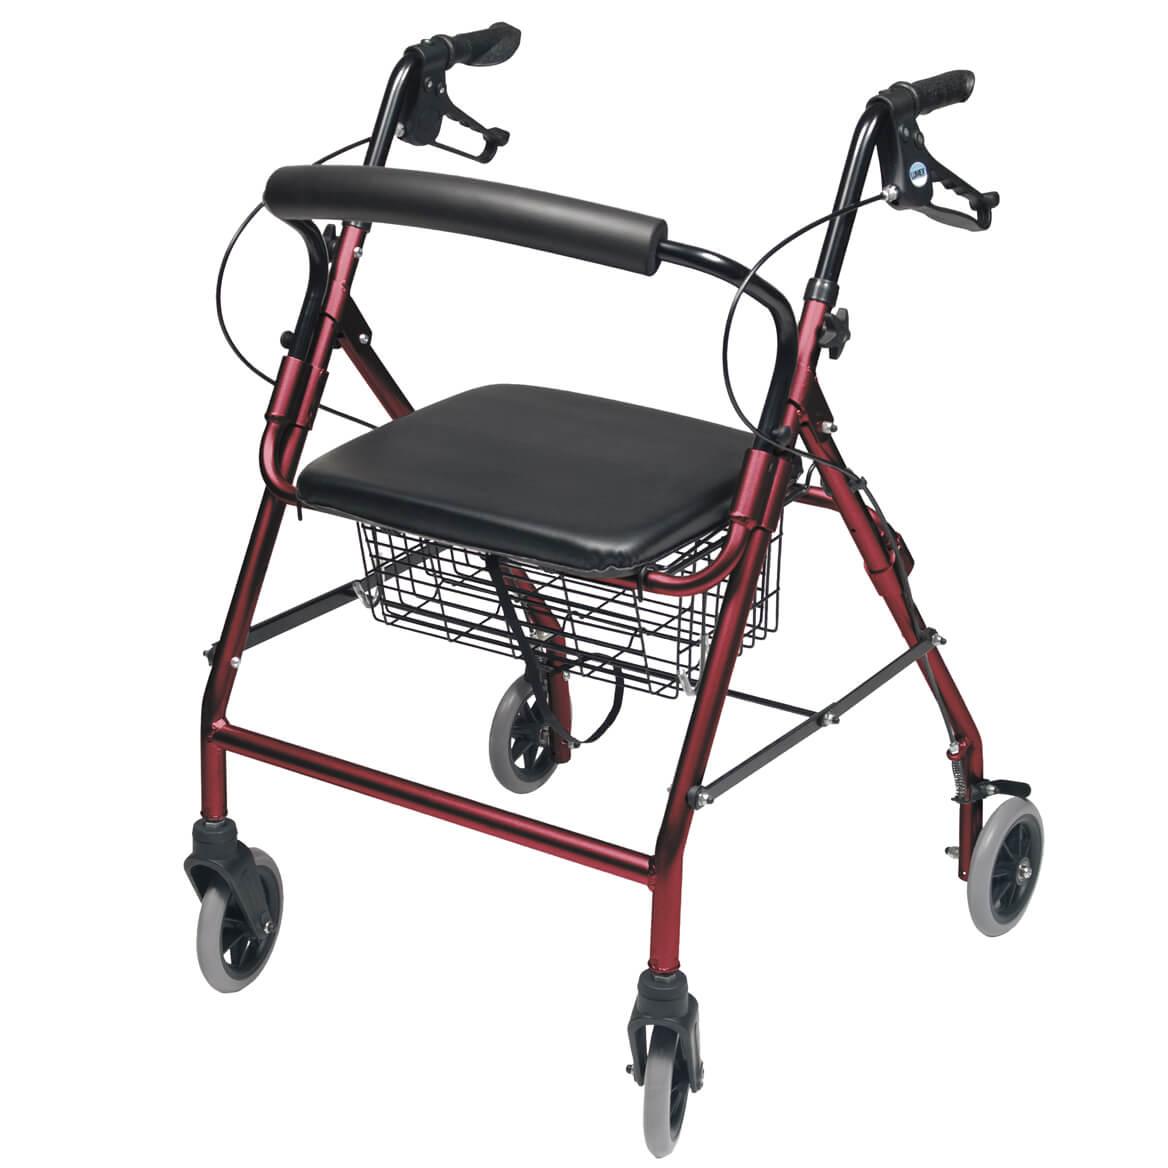 Lumex® Walkabout Wide 4 Wheeled Walkers-340684